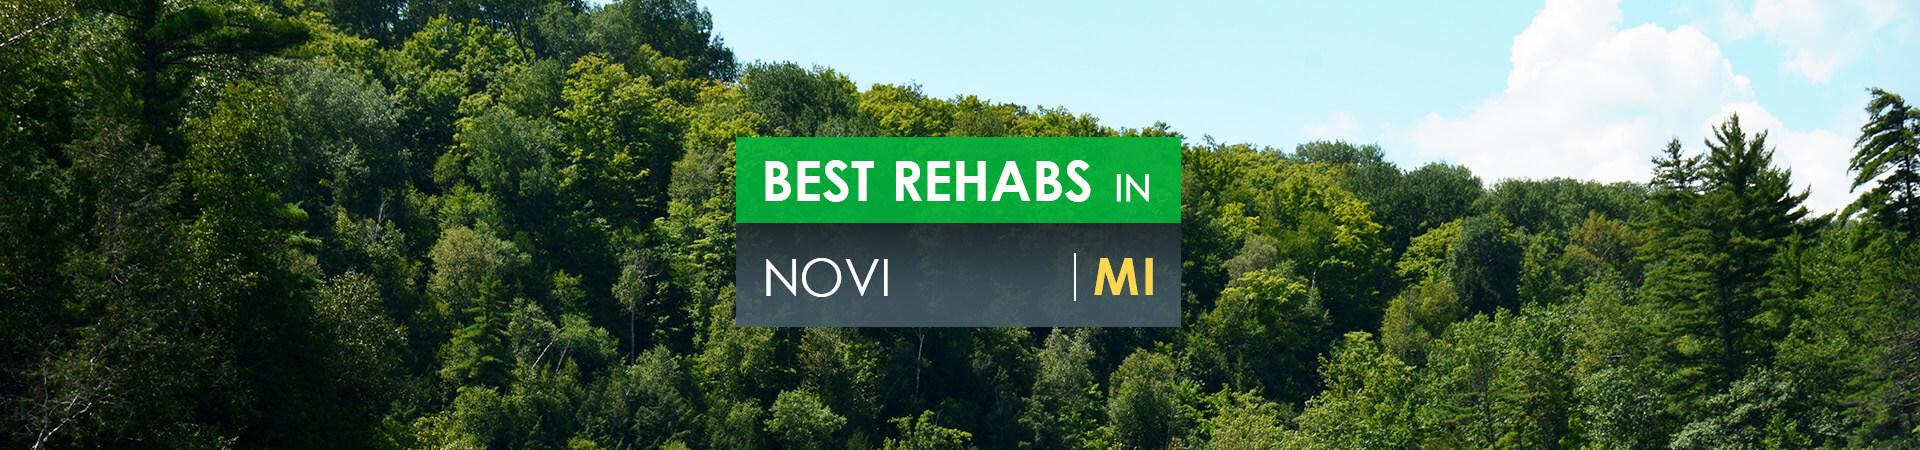 Best rehabs in Novi, MI